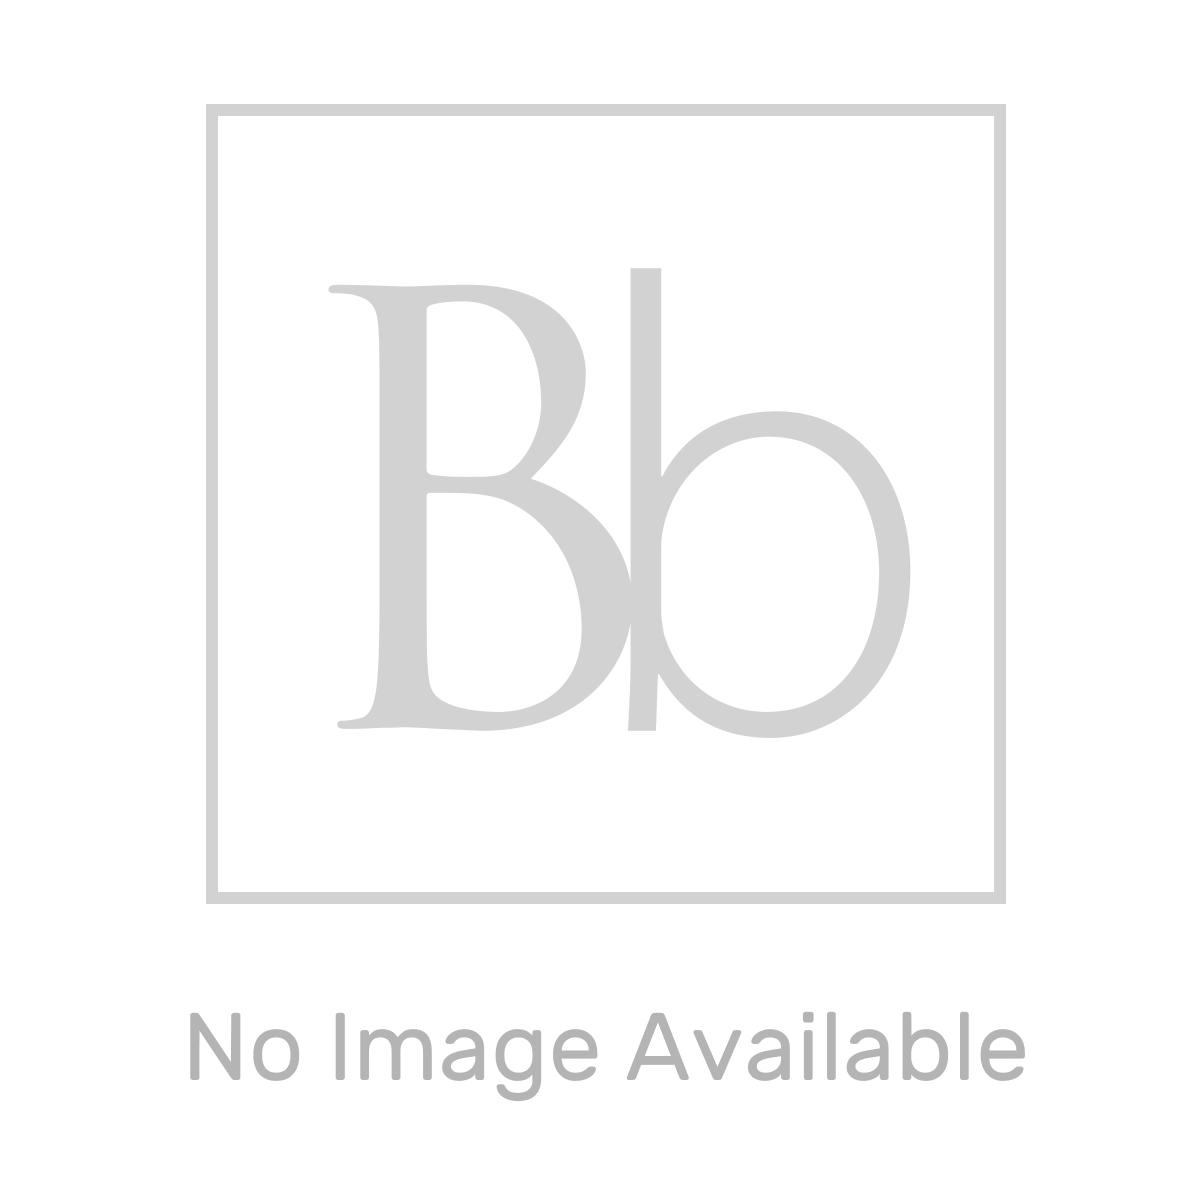 Vitra S50 Open Back Close Coupled Toilet